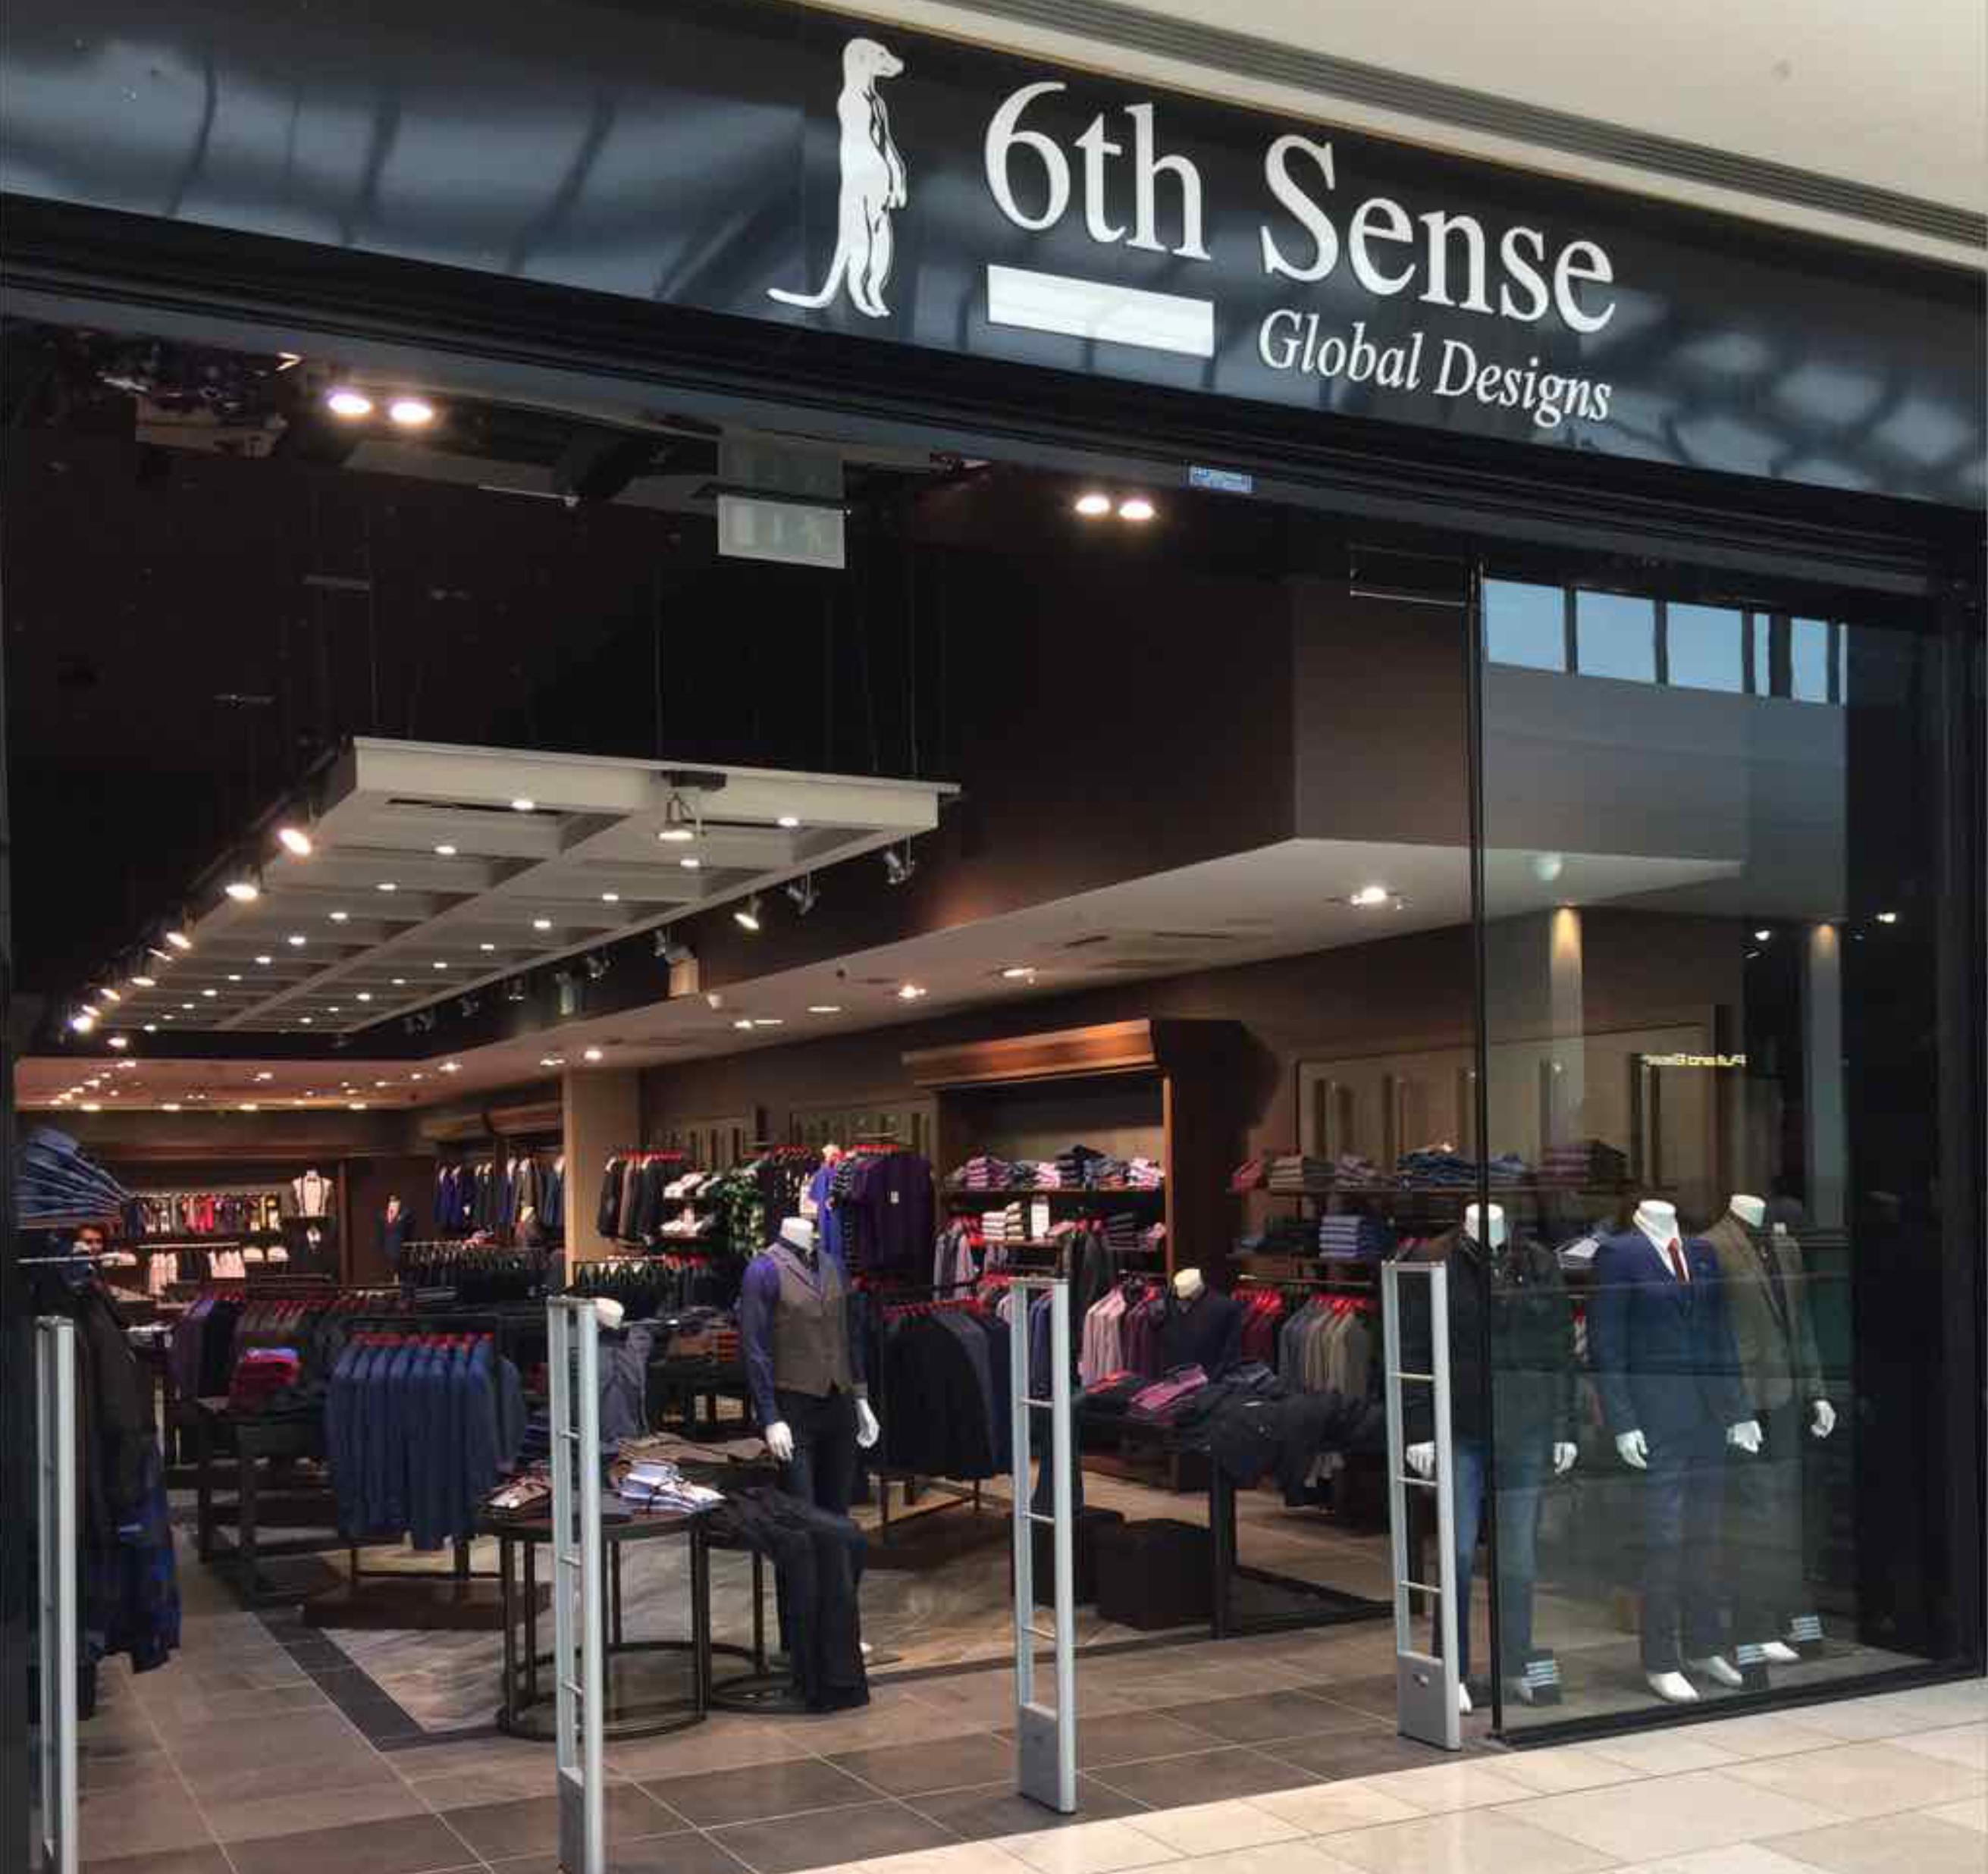 6th Sense New Store Exterior